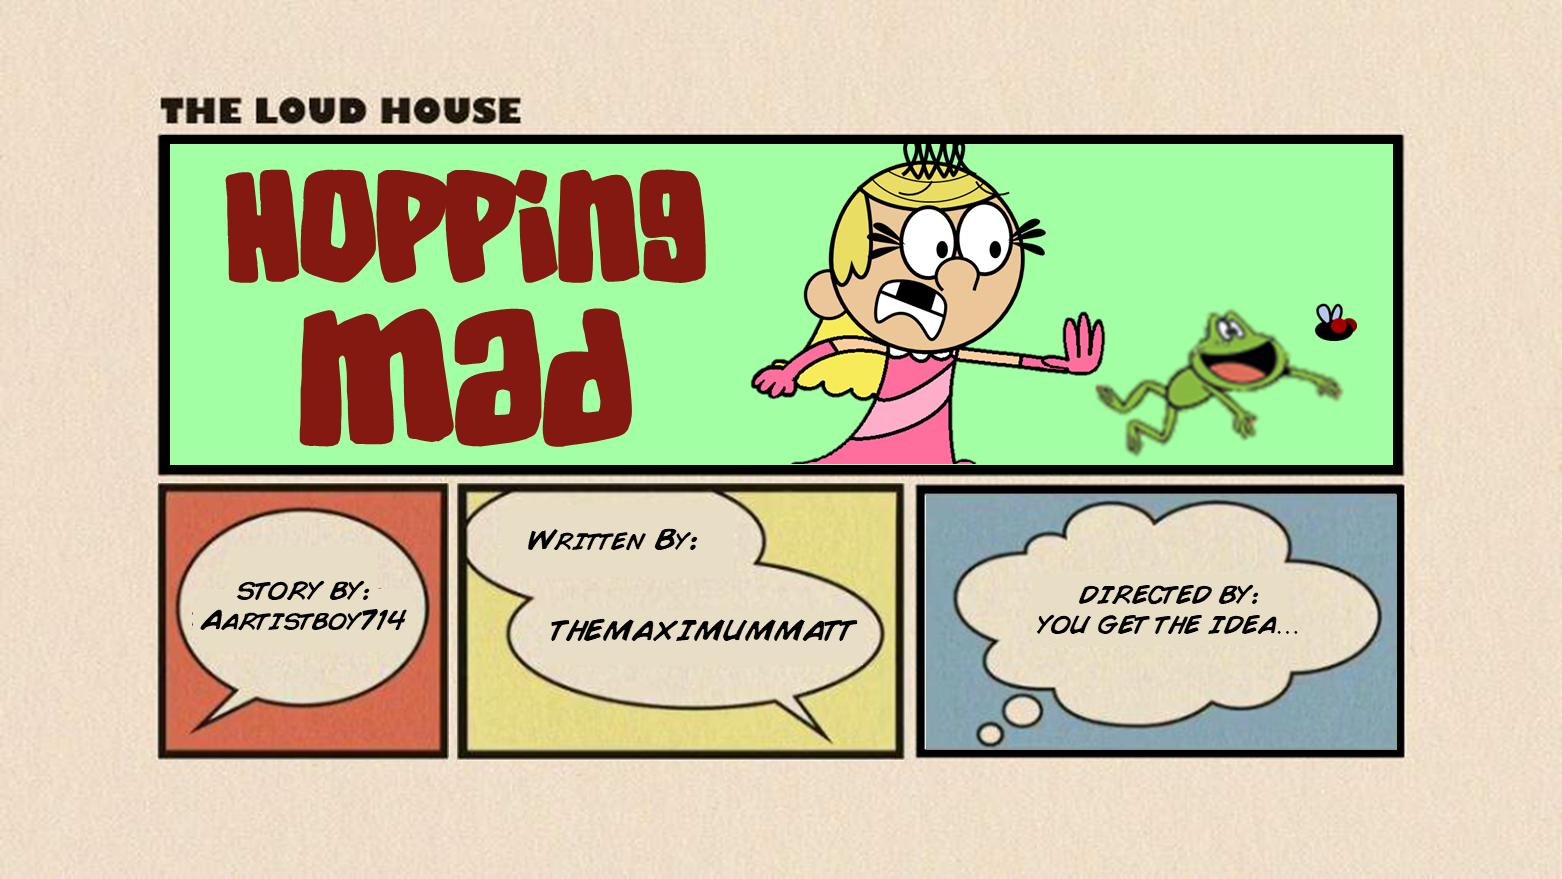 User blog:TheMaximumMatt/Fanfiction - Hopping Mad | The Loud House